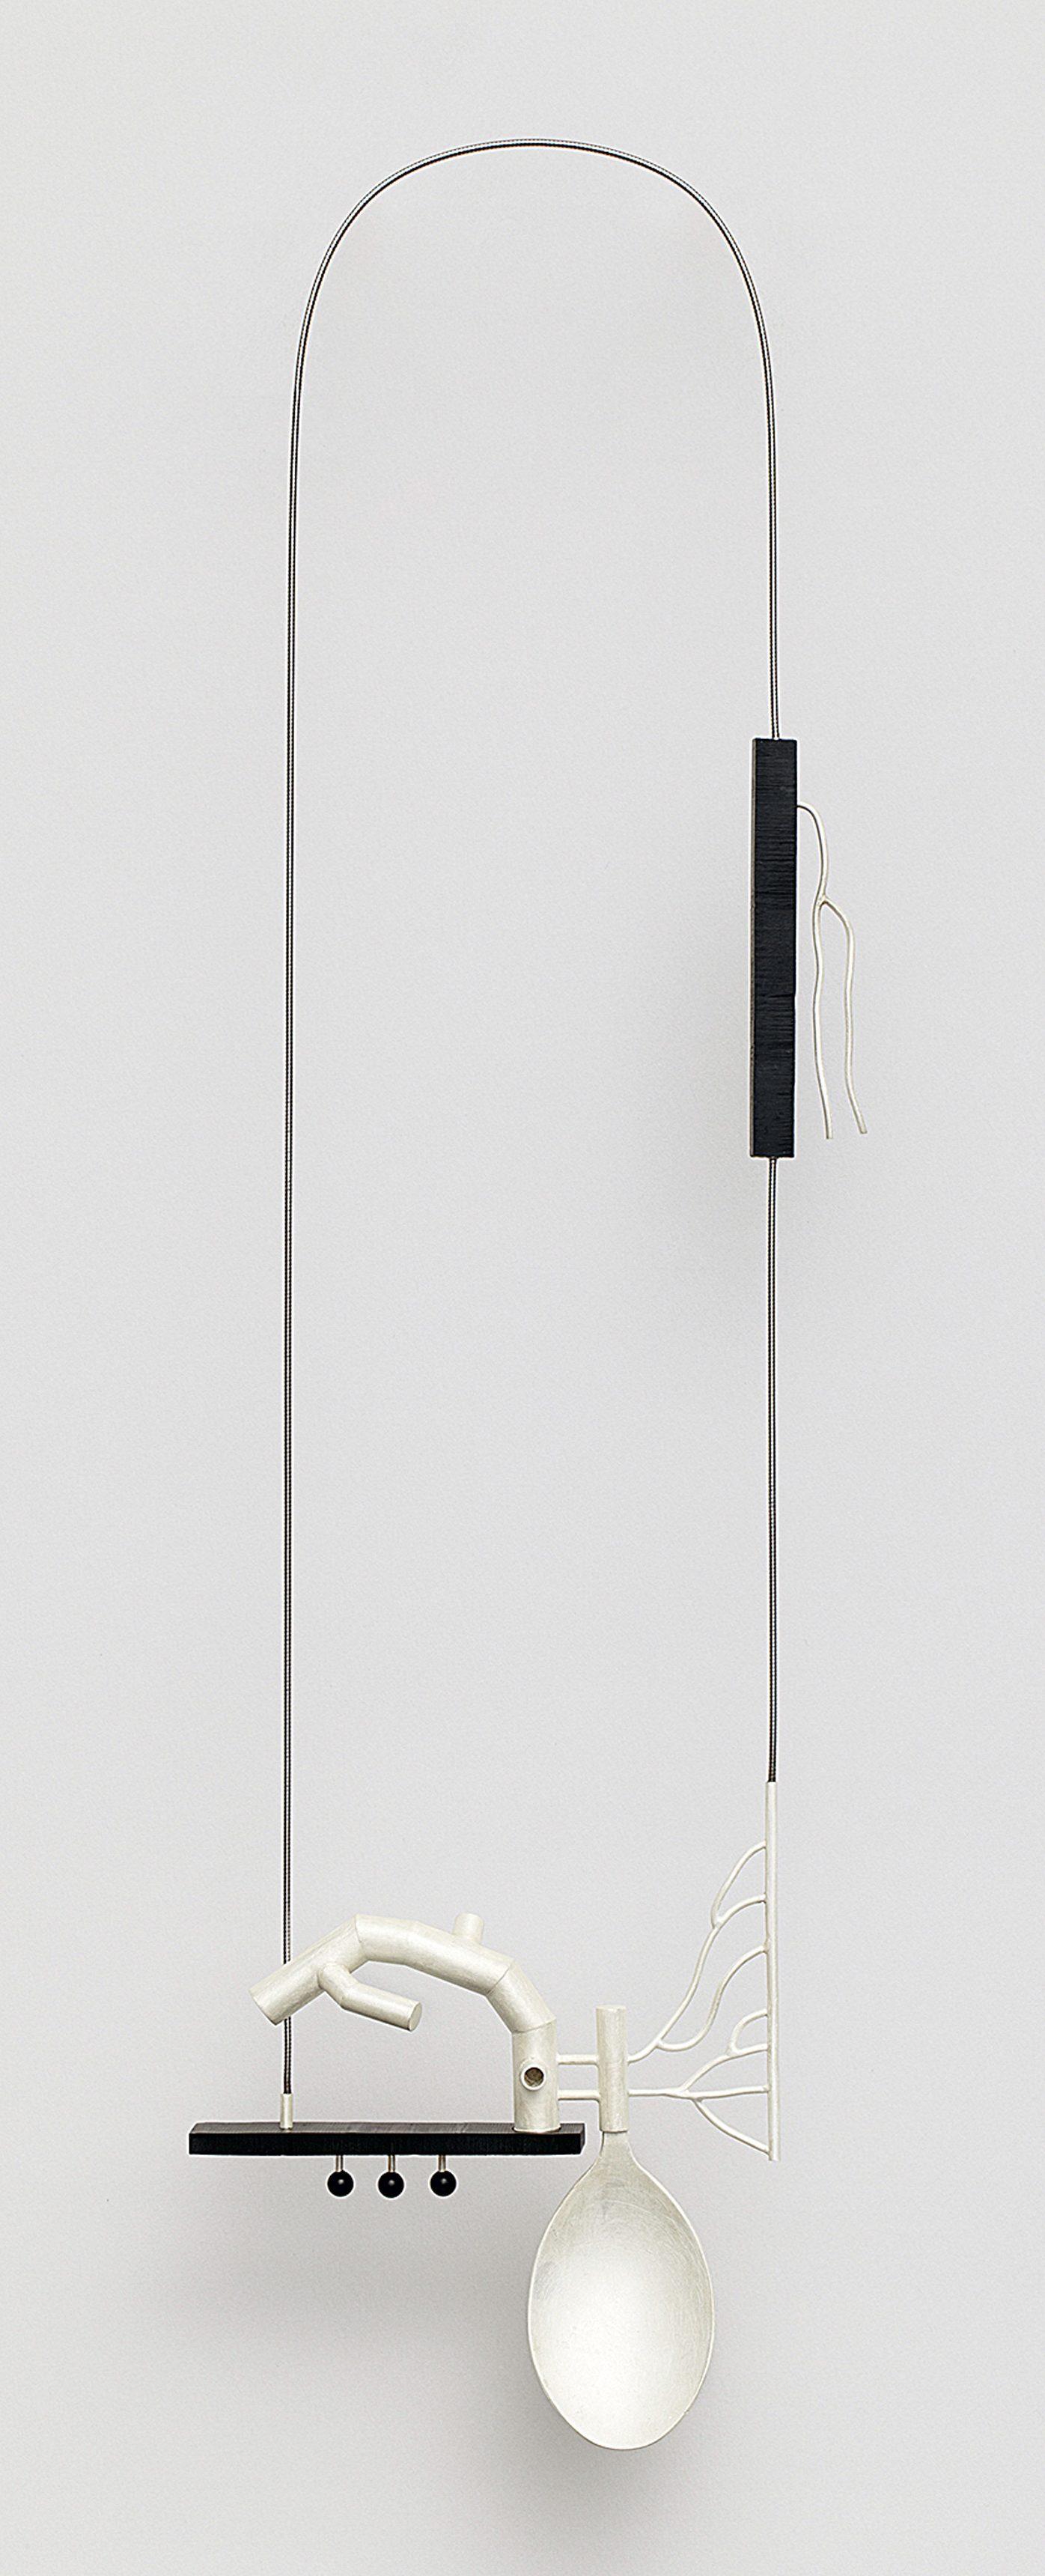 Katja Prins, Inter-Act 04, halssieraad, 2011. Collectie CODA. Foto CODA, zilver, onyx, staal